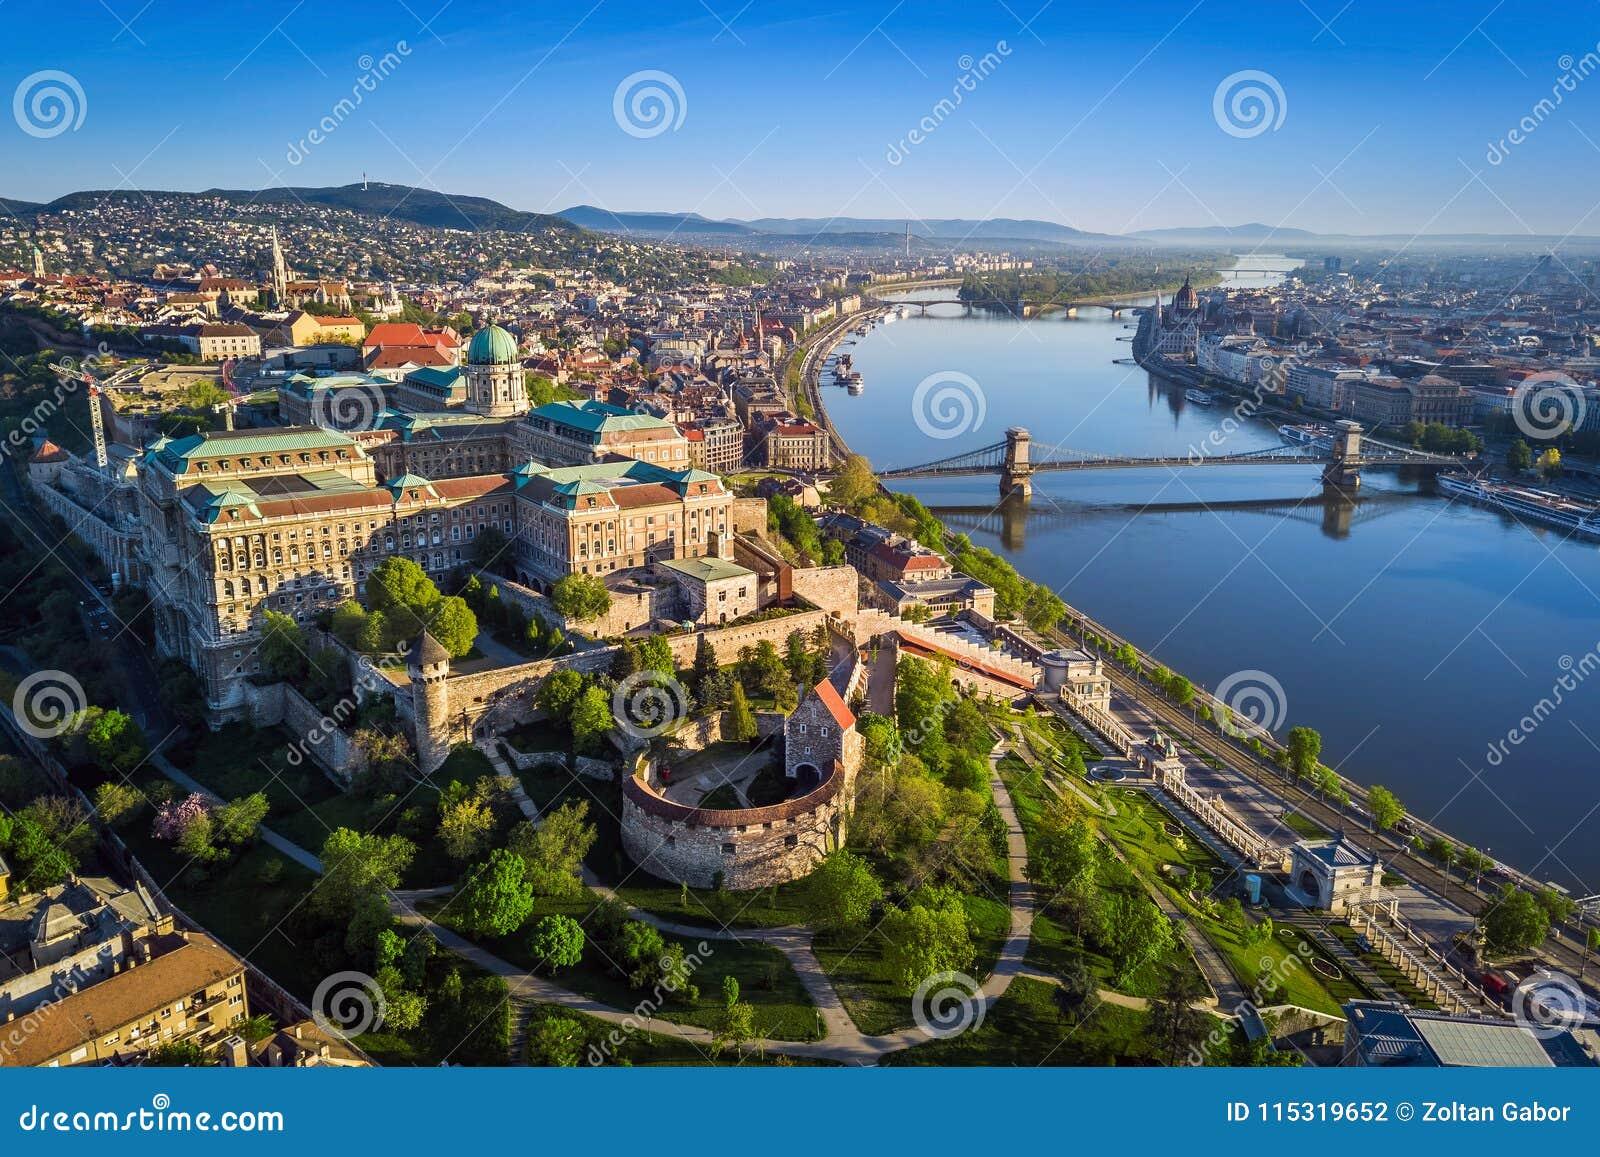 Boedapest, Hongarije - Mooie luchthorizonmening van Buda Castle Royal Palace en Zuiden Rondella bij zonsondergang